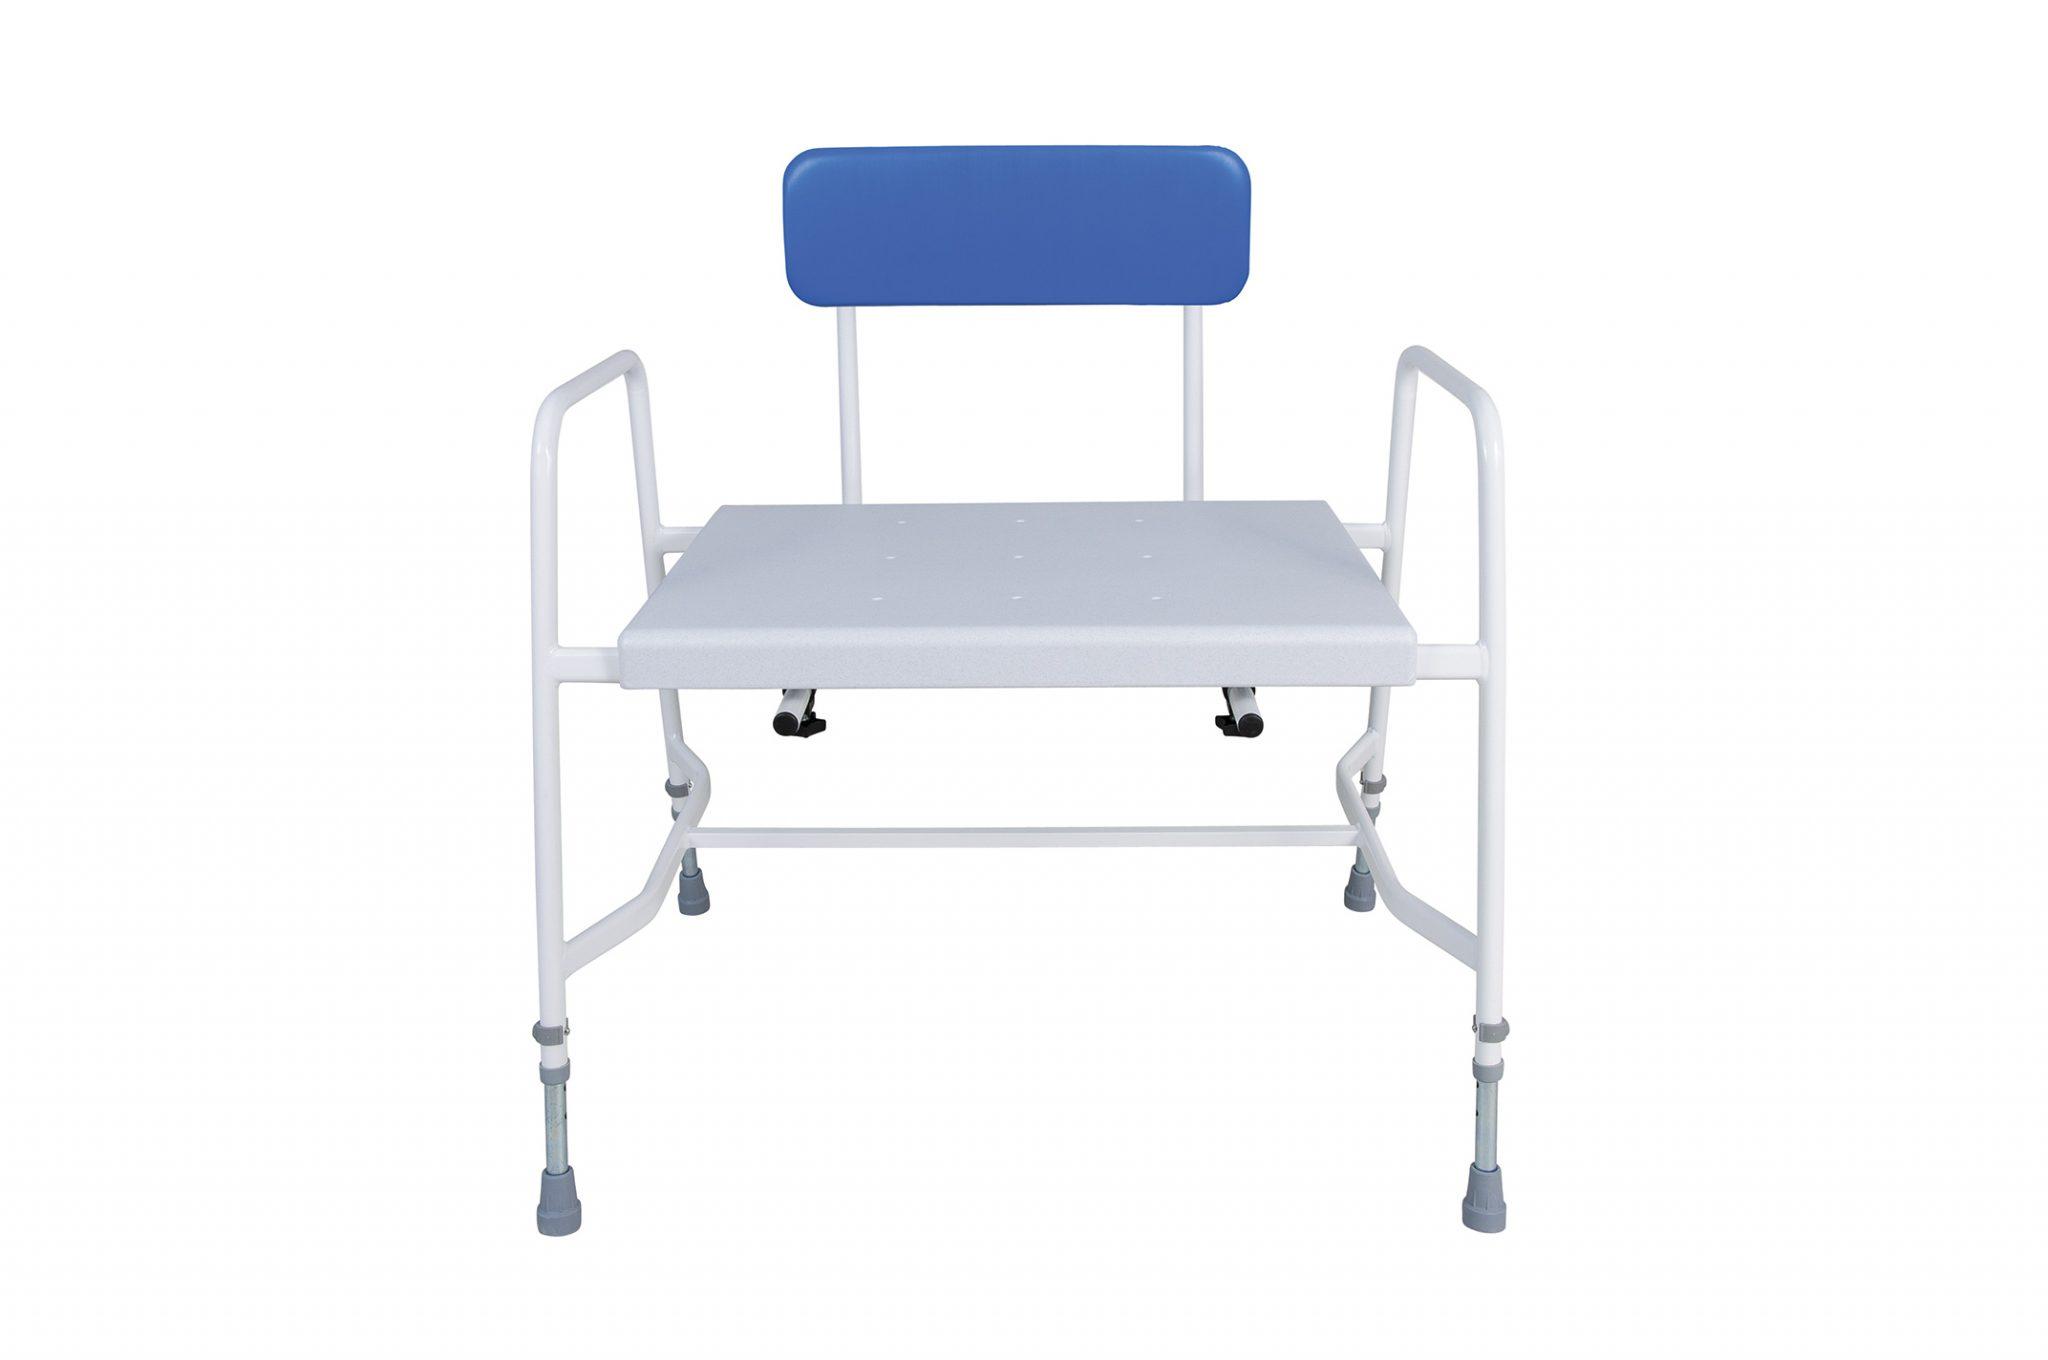 X281 Bariatric Shower Chair - Cefndy Healthcare